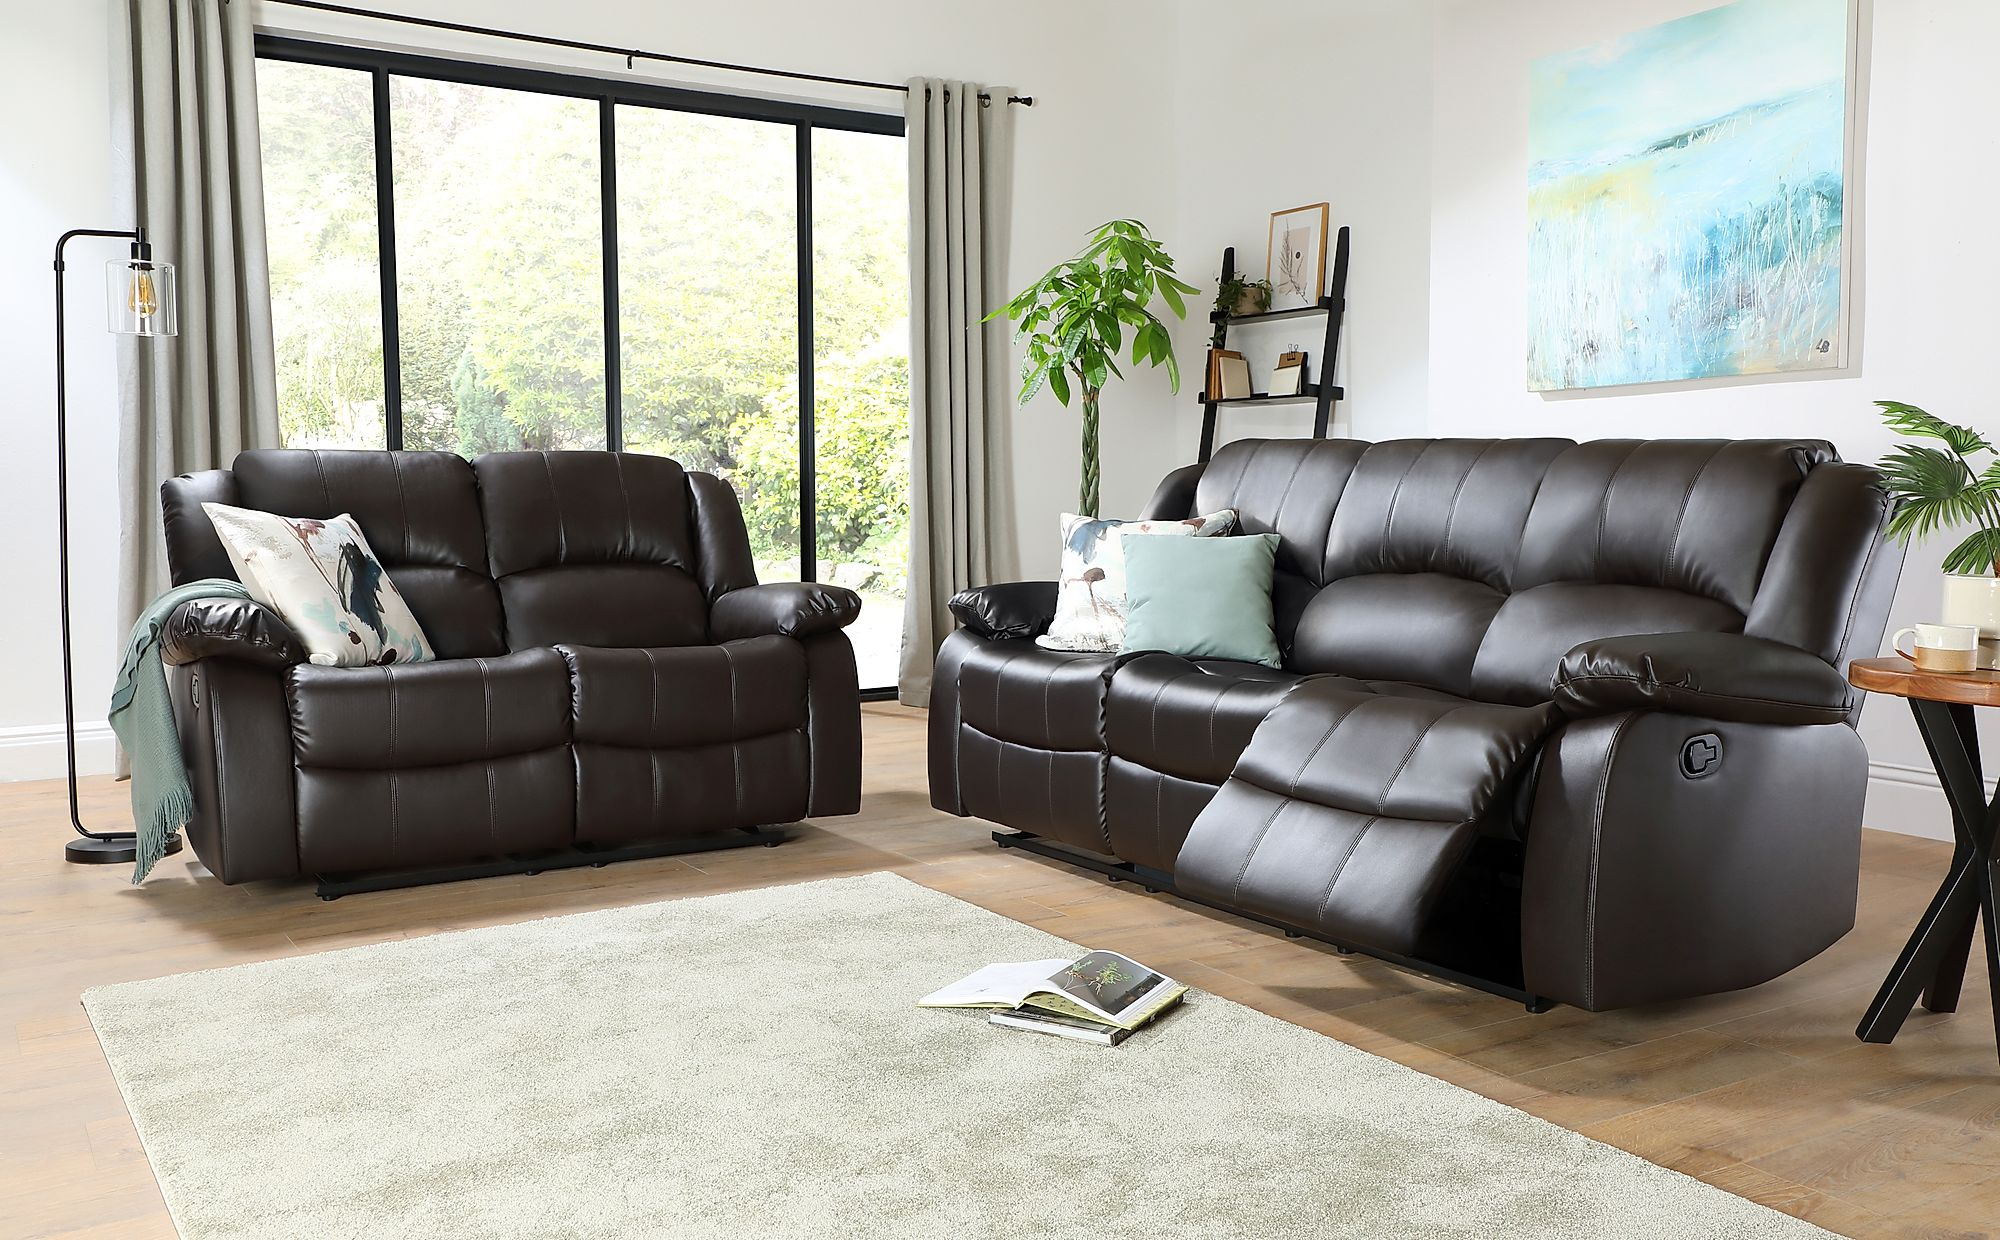 Dakota Brown Leather 3+2 Seater Recliner Sofa Set